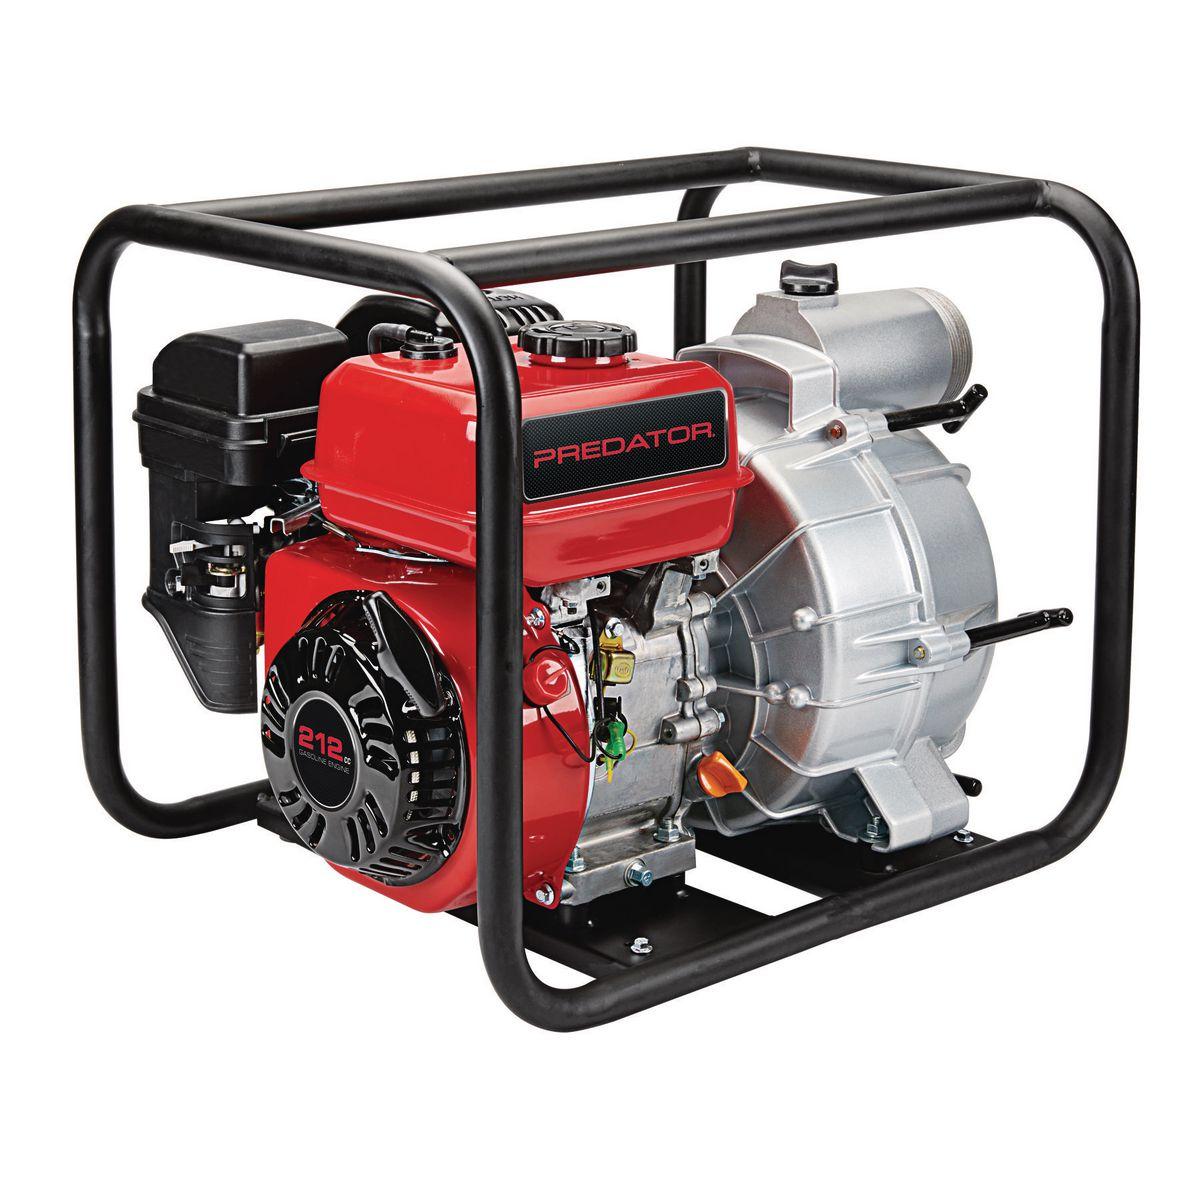 PREDATOR 3 in. 212cc Gasoline Engine Semi-Trash Water Pump - 290 GPM - Item 63406 / 56162